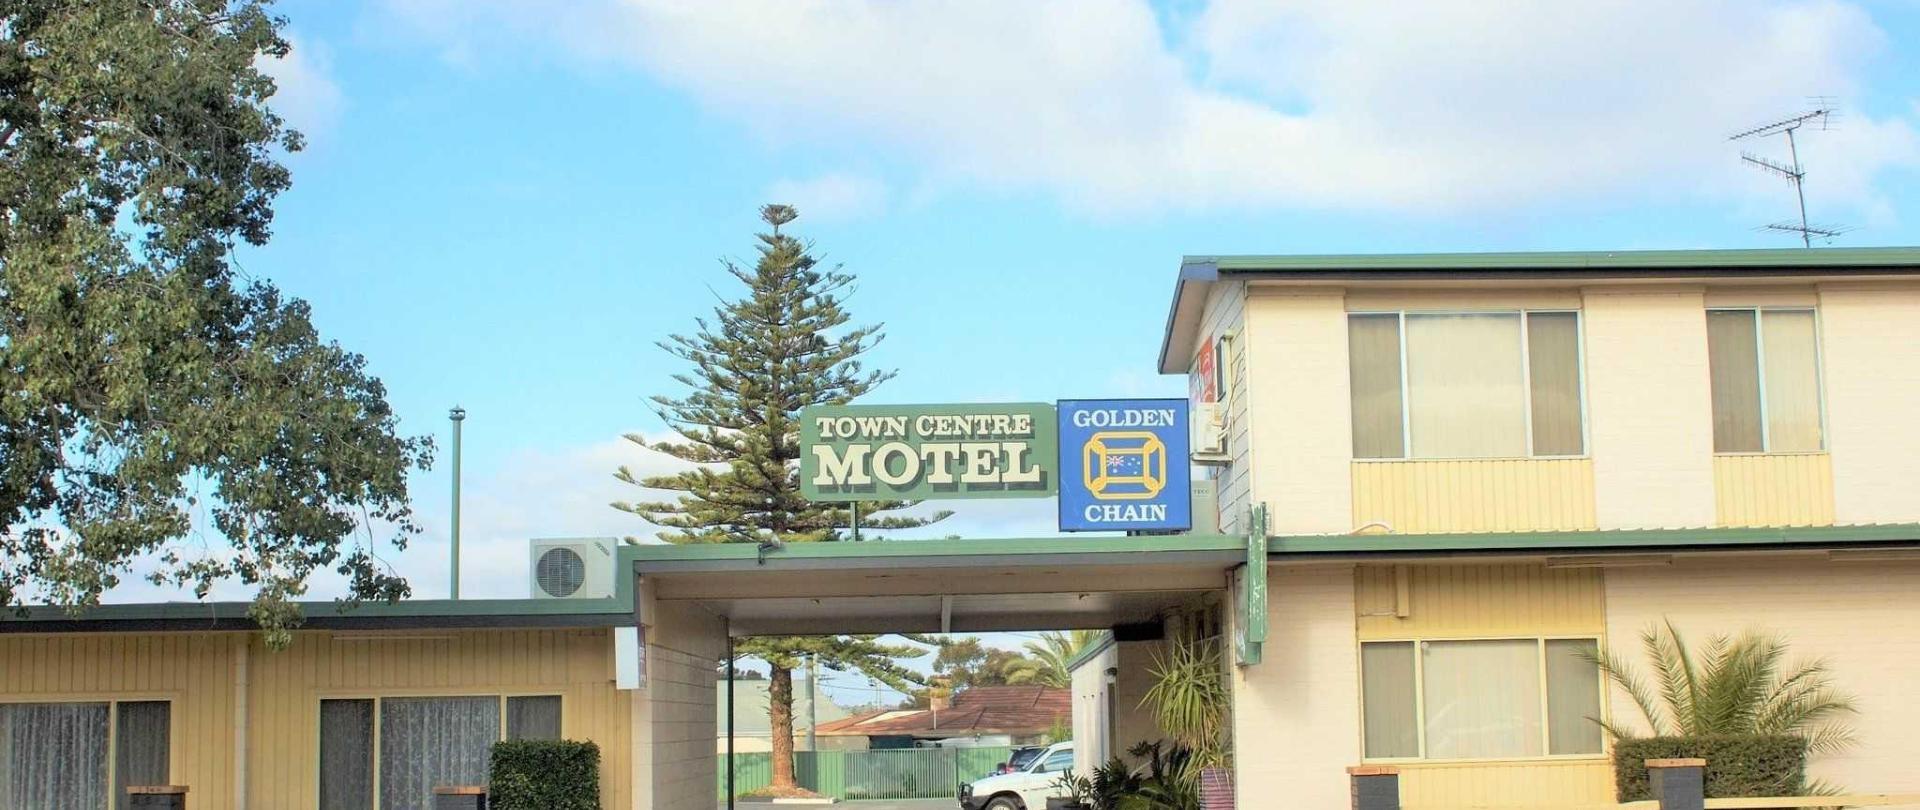 motel-entrance-2-1.jpg